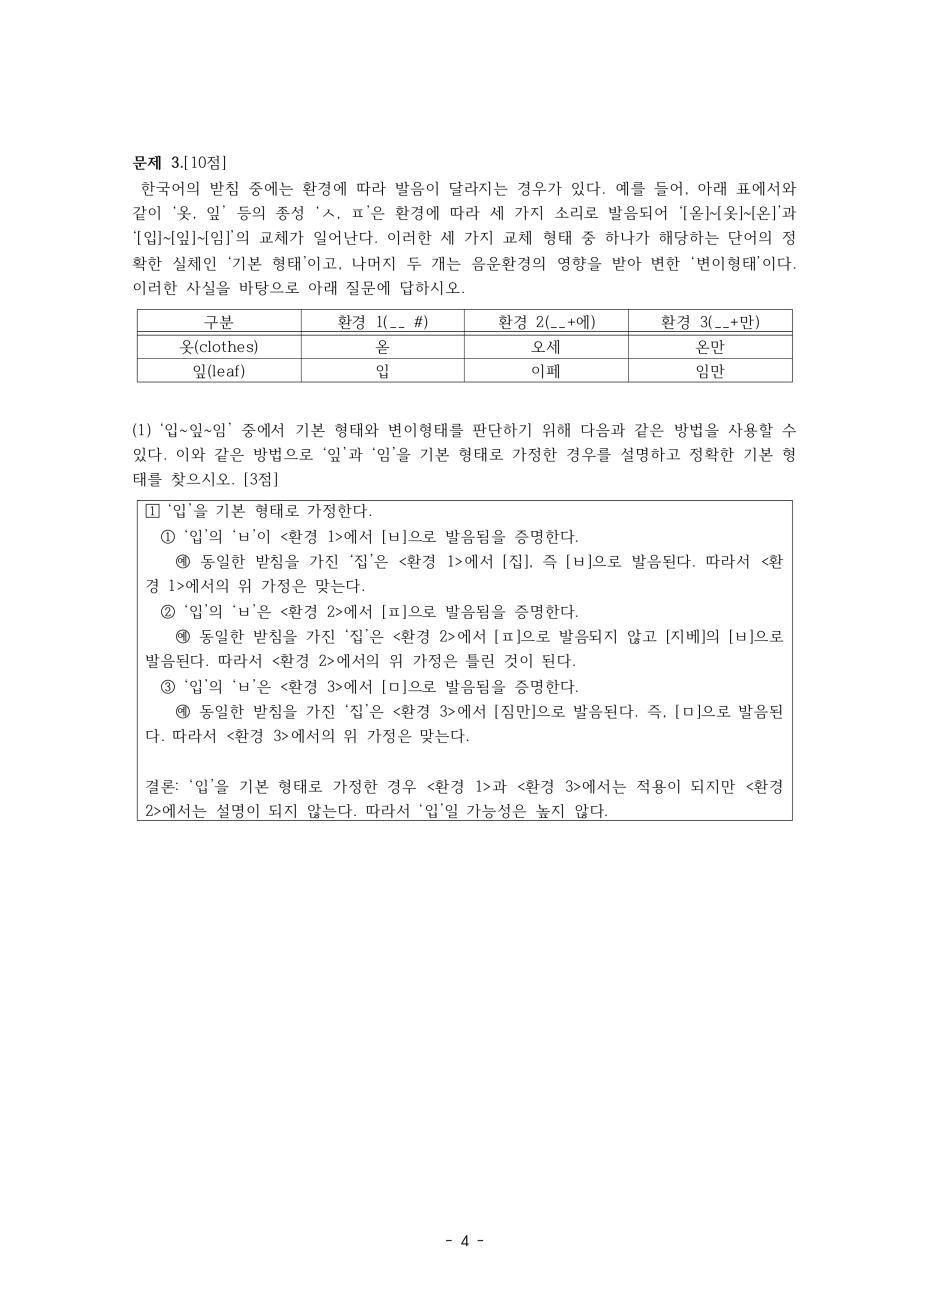 klo2018 4-4